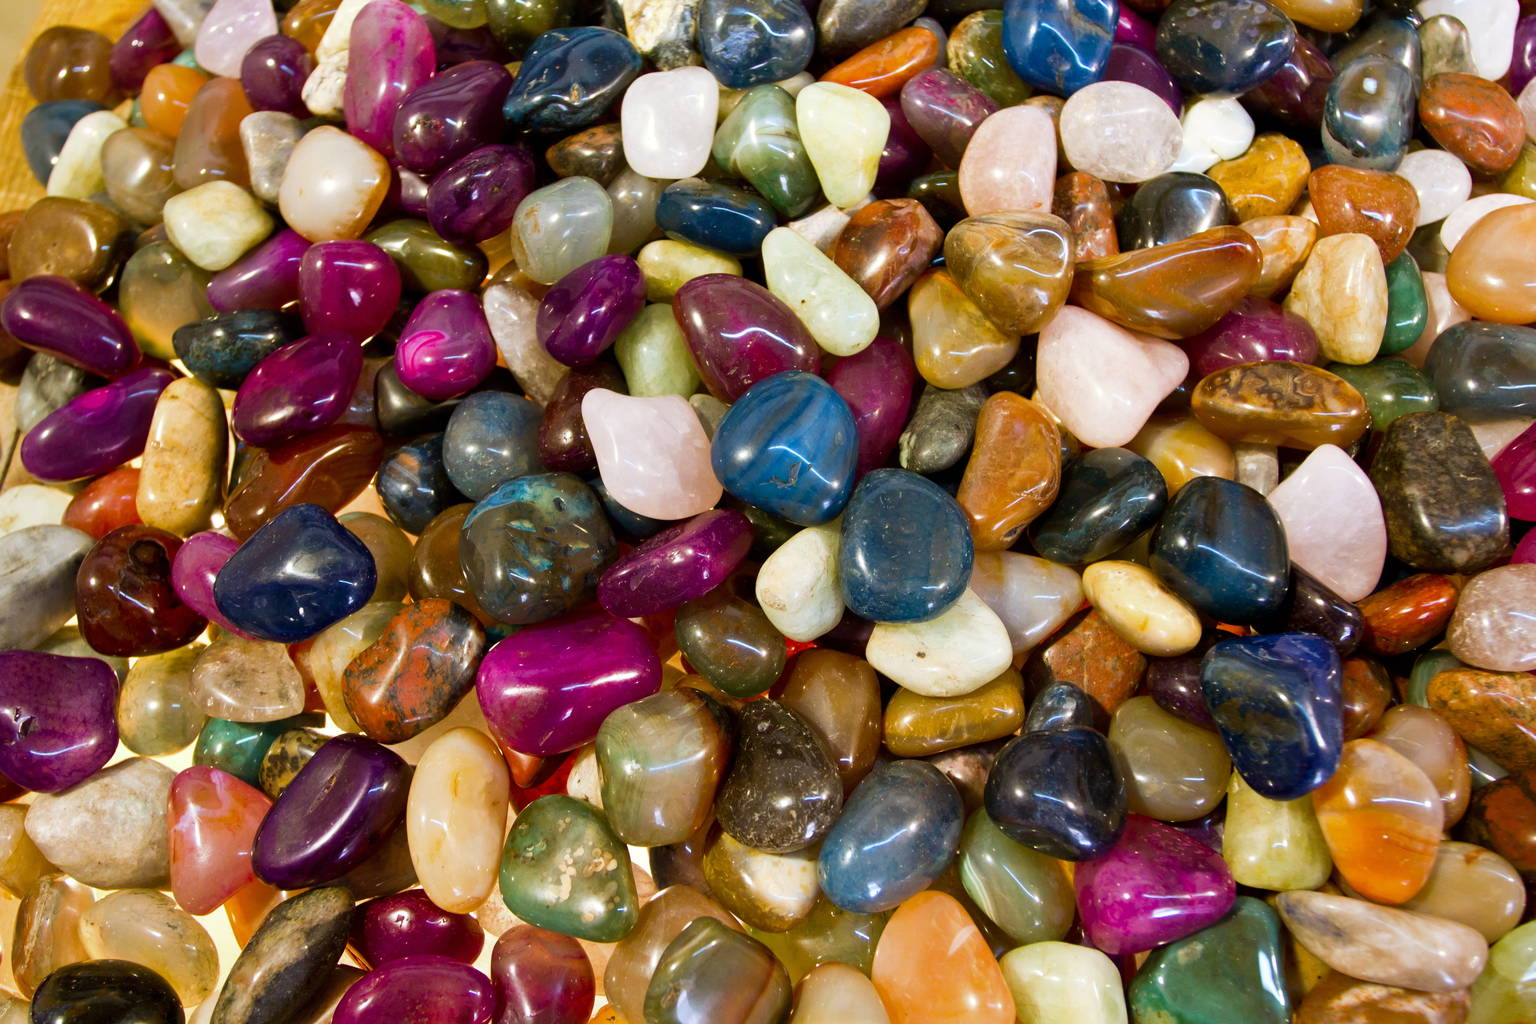 Economic Ores and Minerals